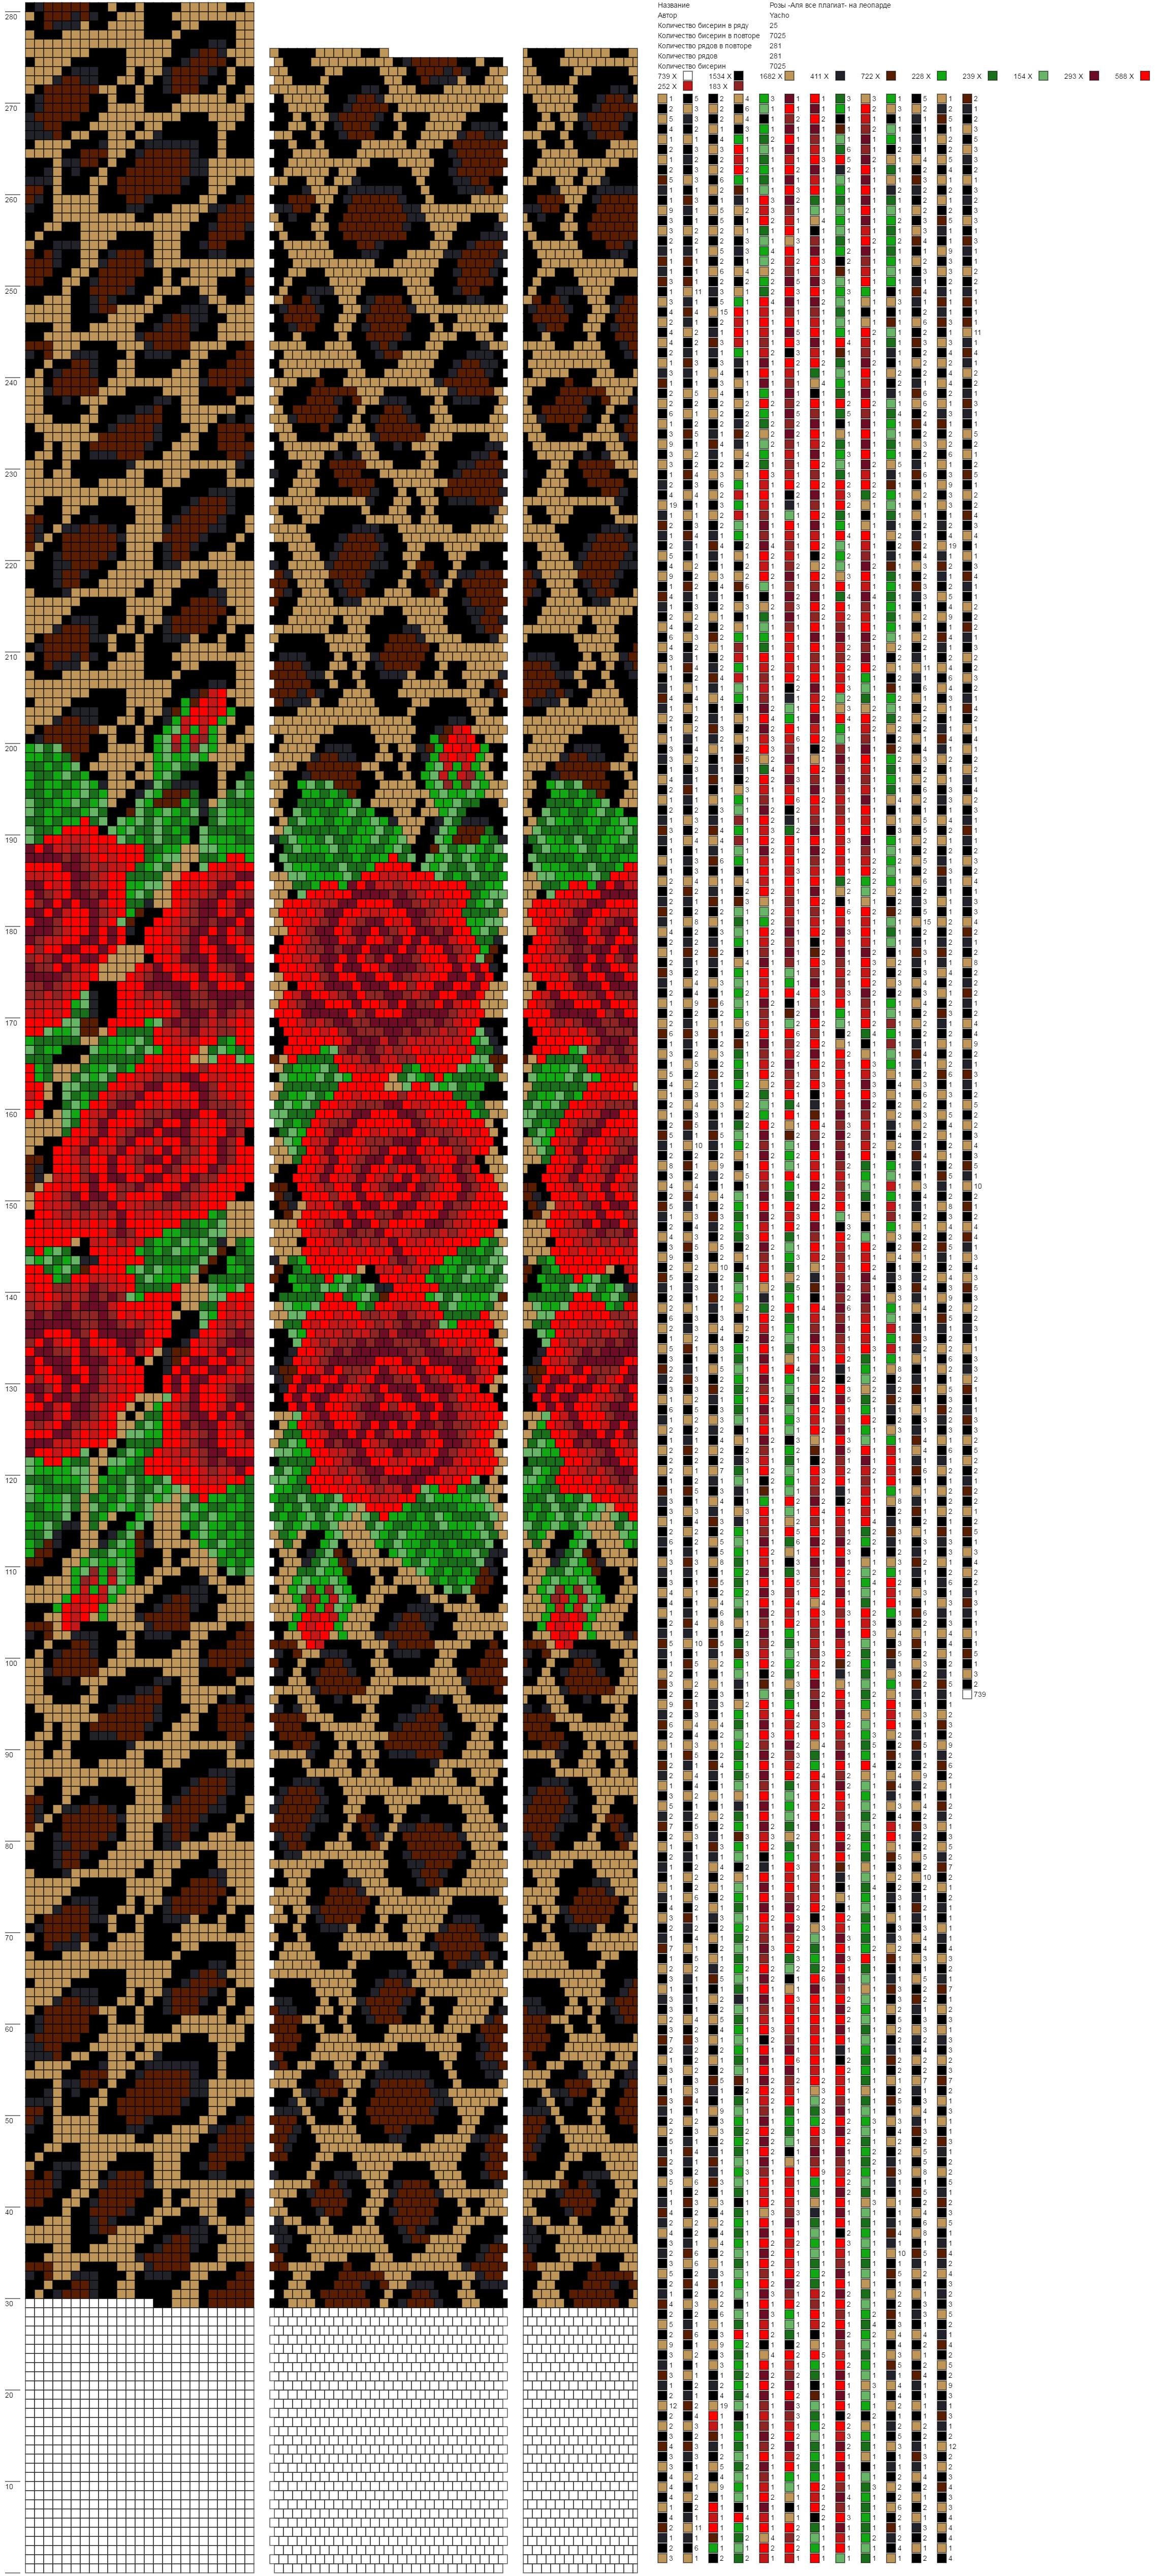 Pin de マロ♪ en Flowers stitch   Pinterest   Puntada peyote, Telar ...